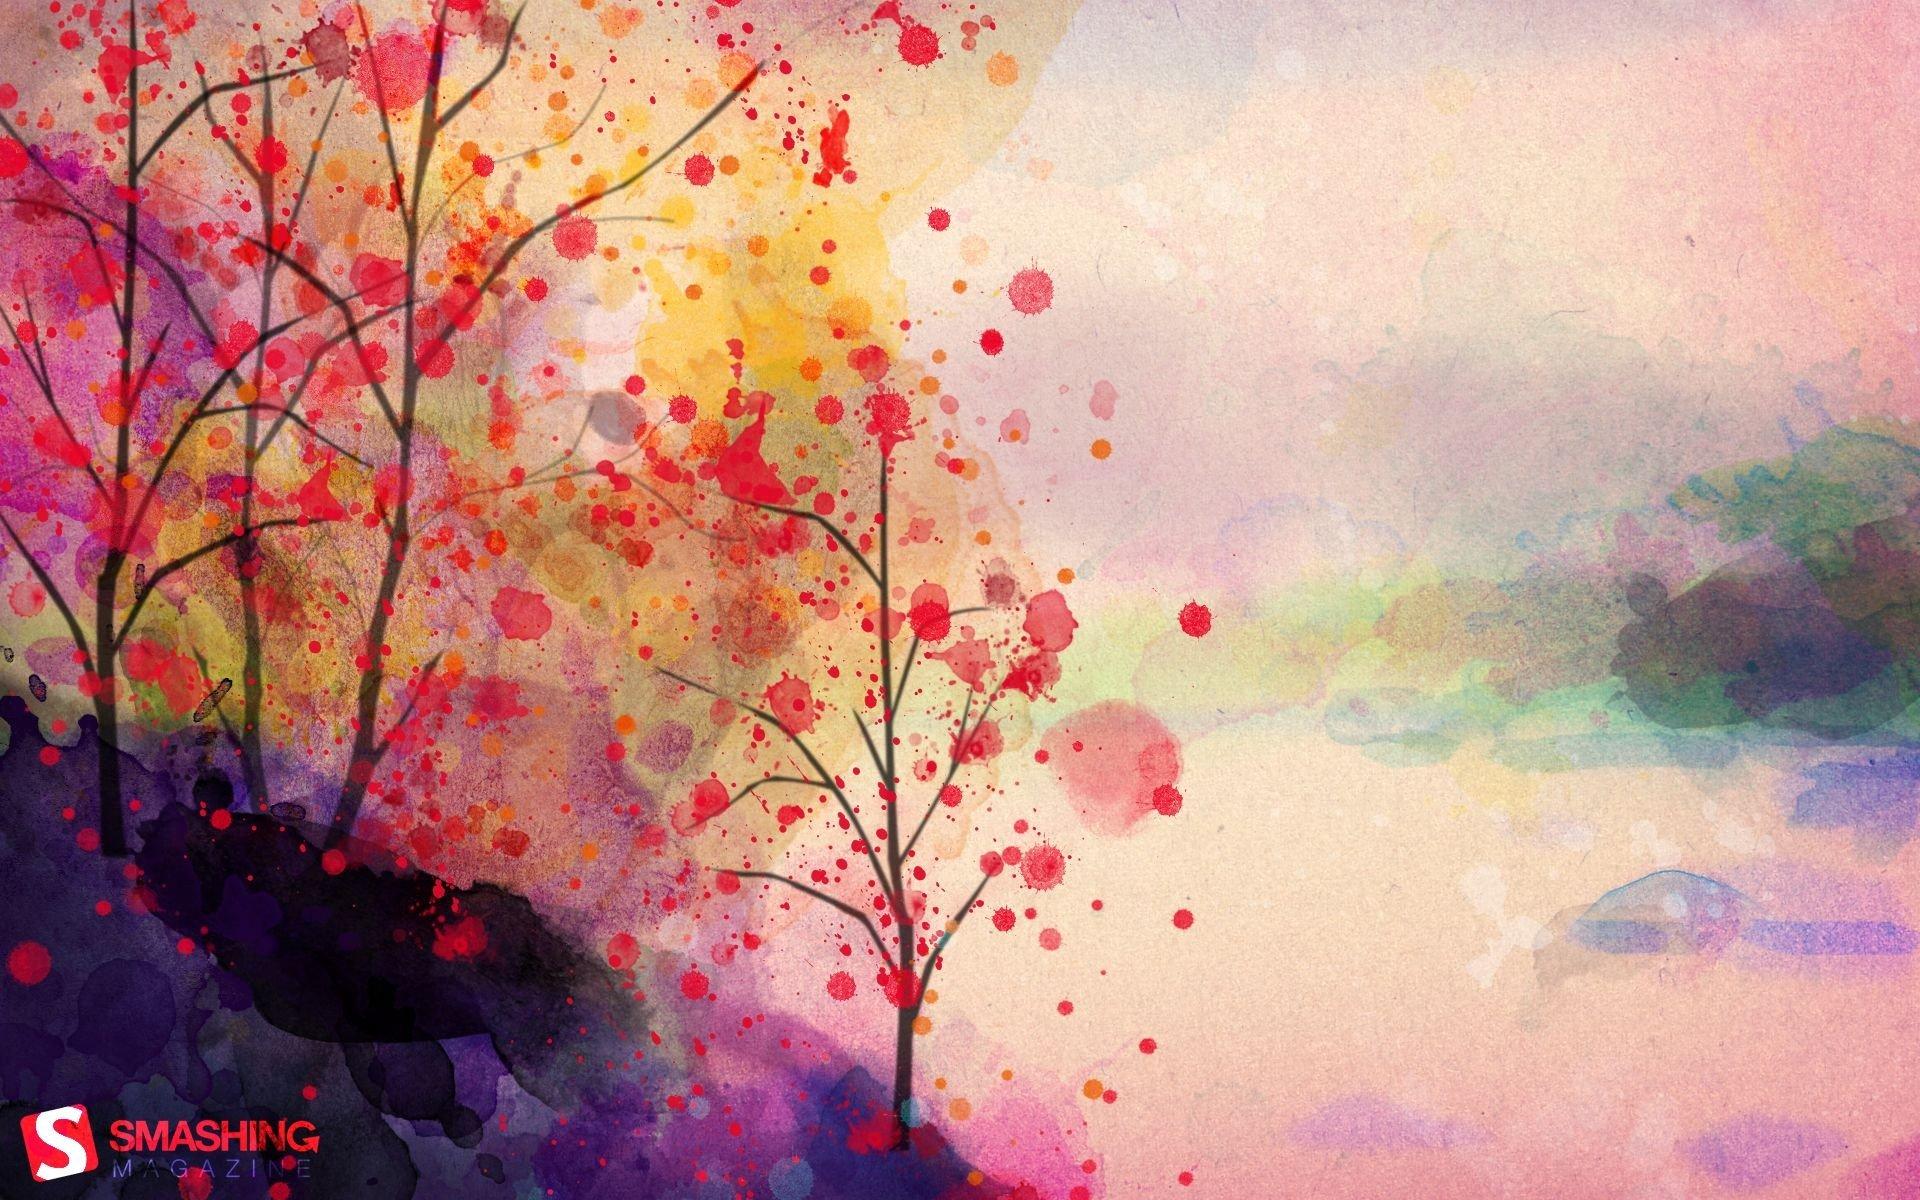 paintings landscapes trees artwork watercolor smashing